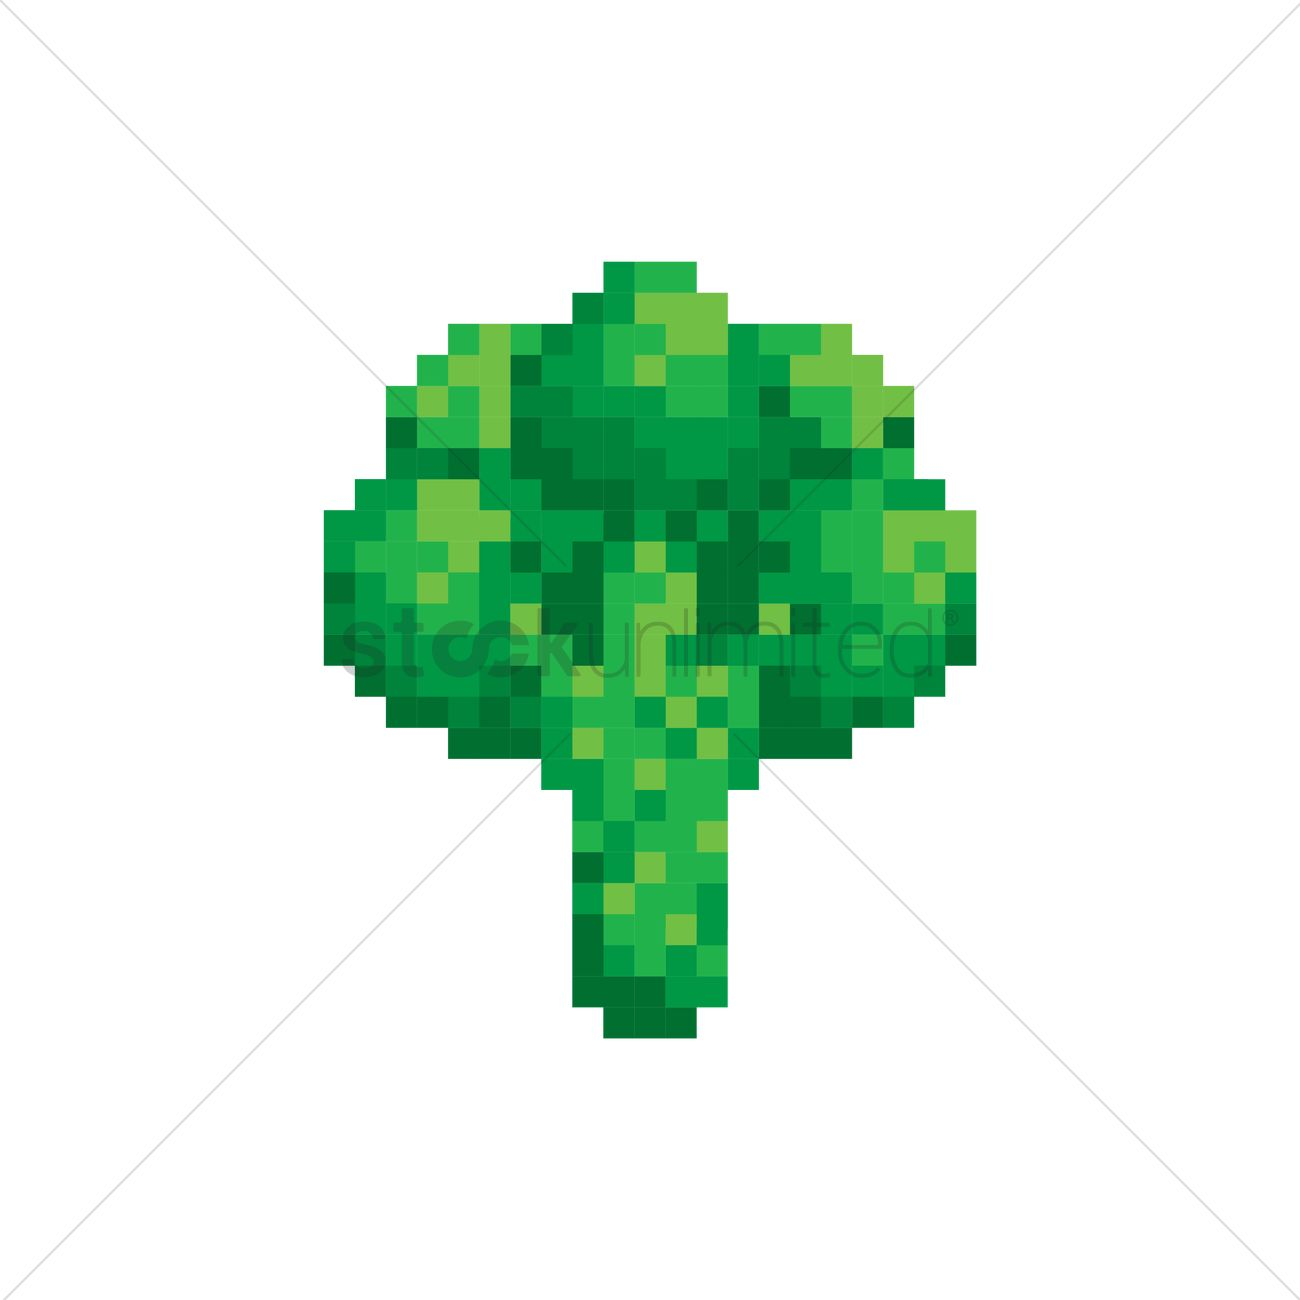 pixel art broccoli vector image 1987419 stockunlimited pixel art broccoli vector image